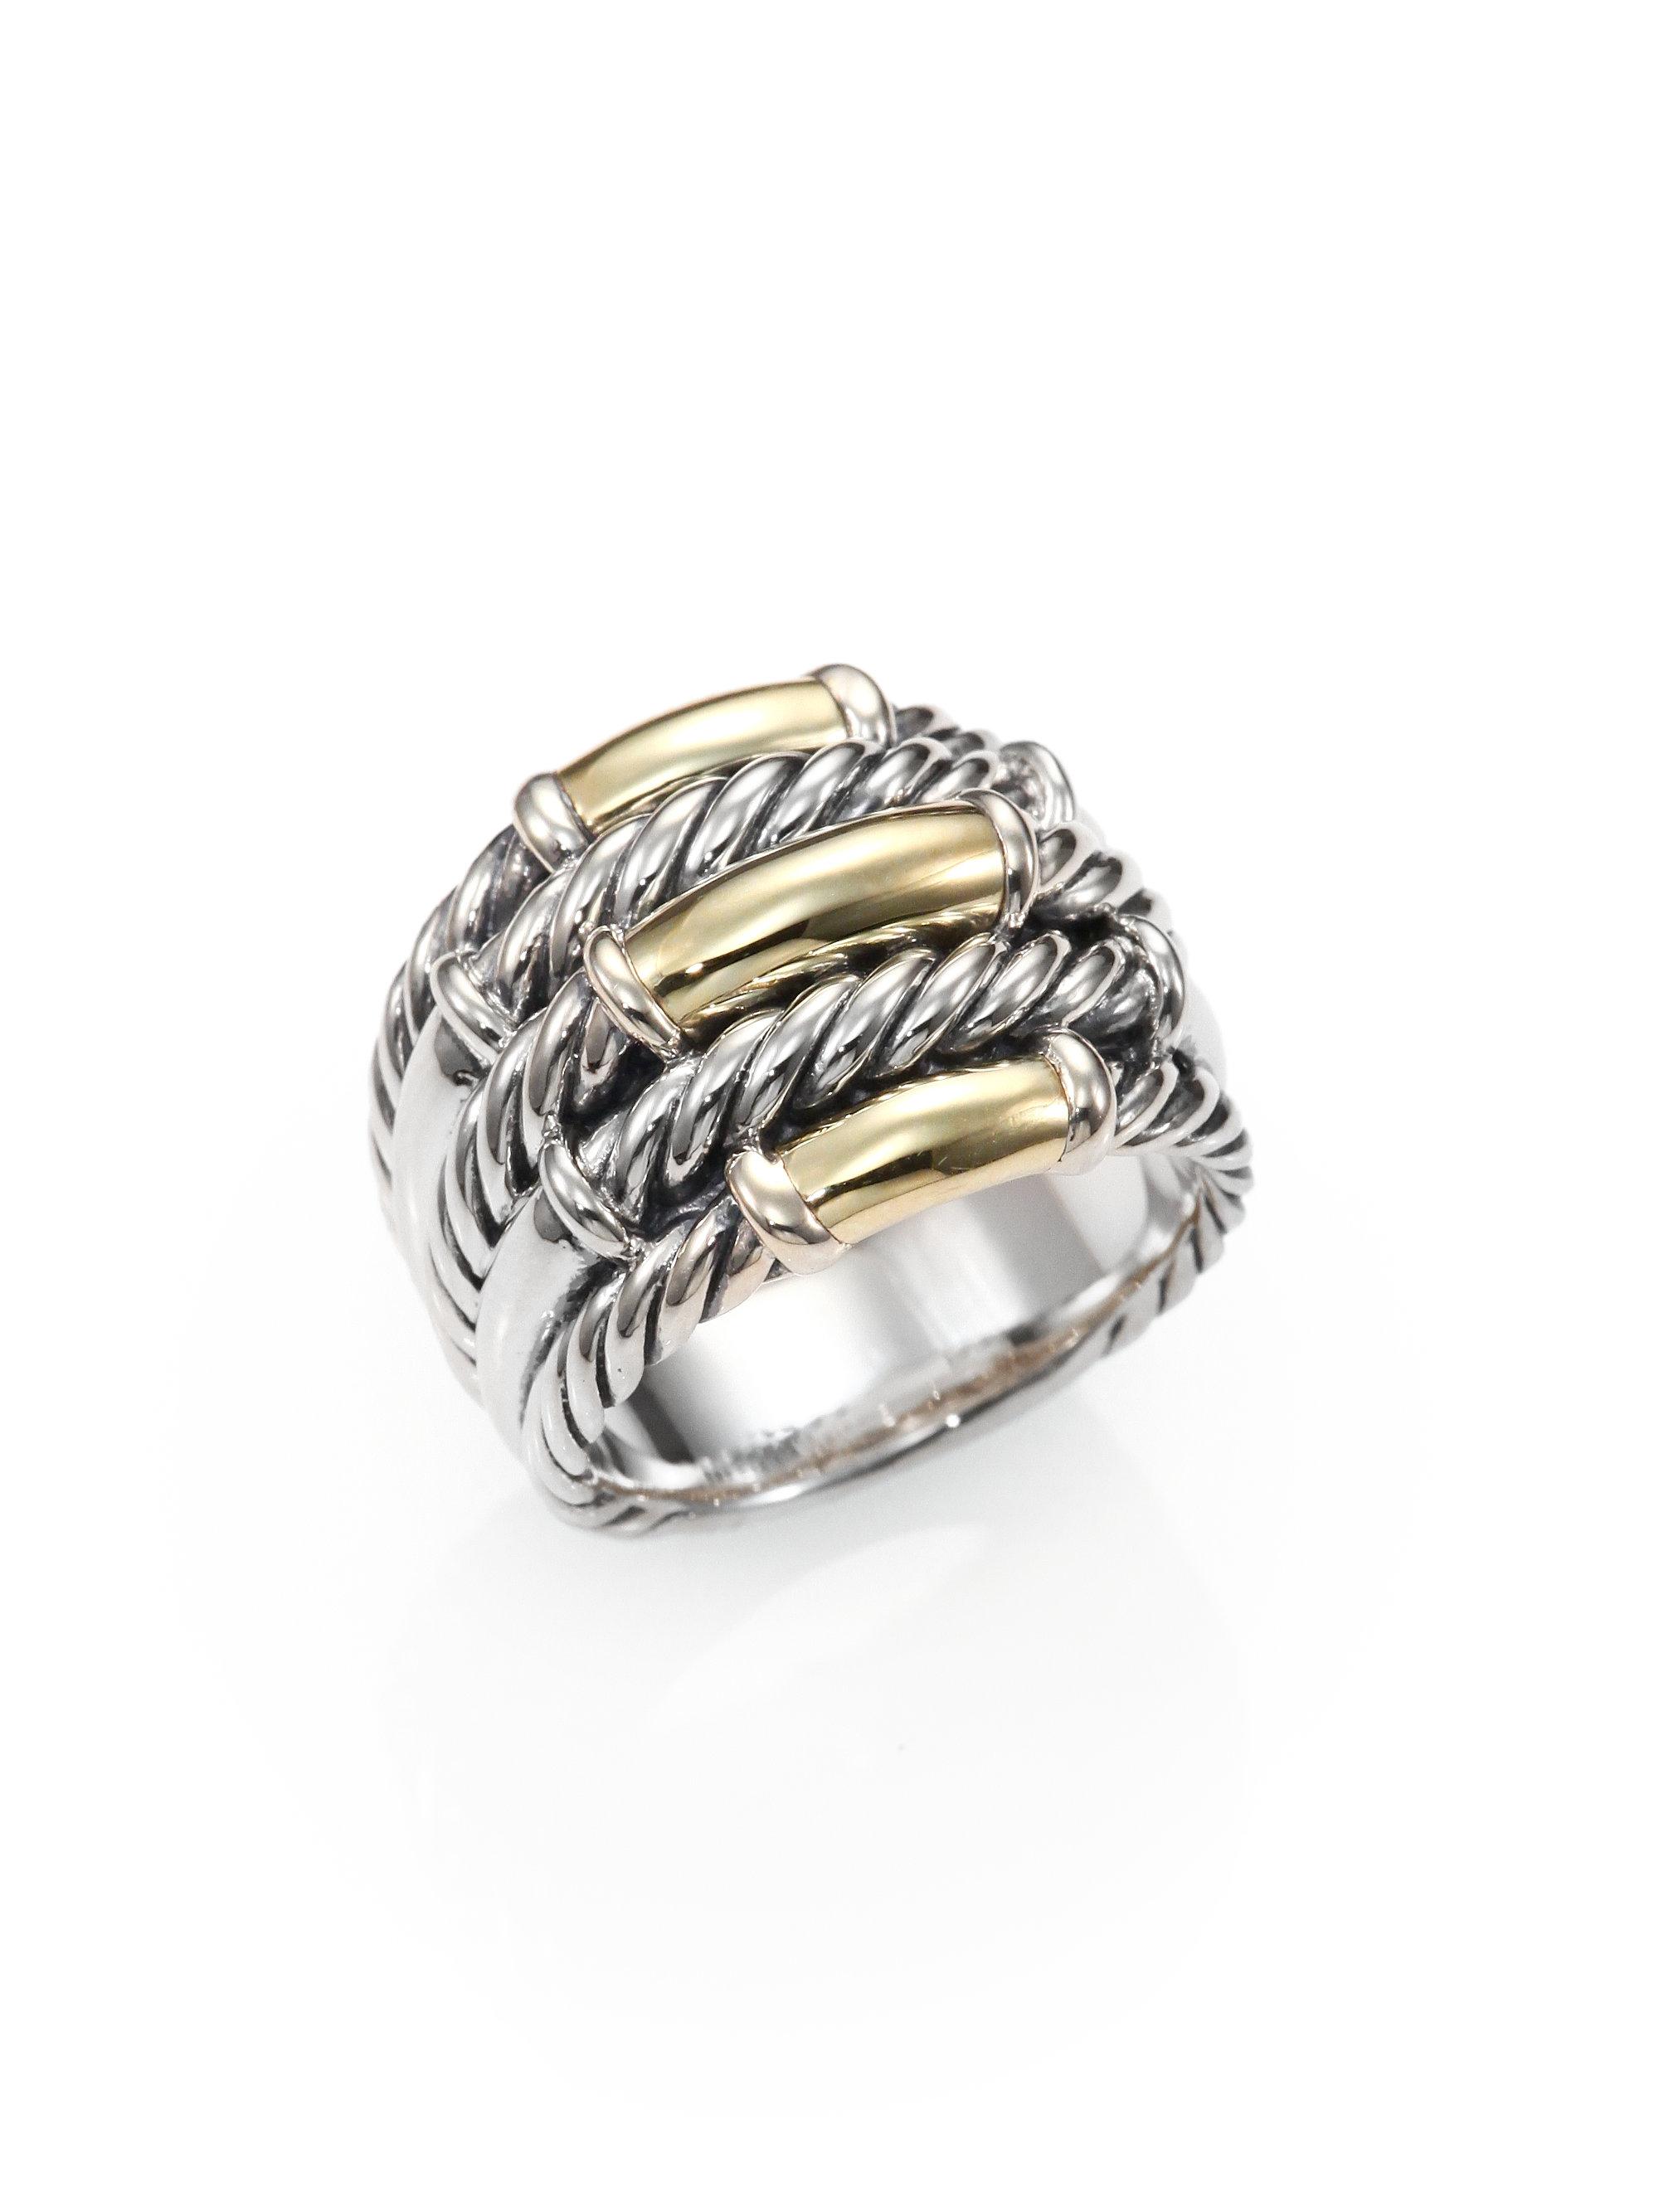 david yurman sterling silver 18k gold ring in silver